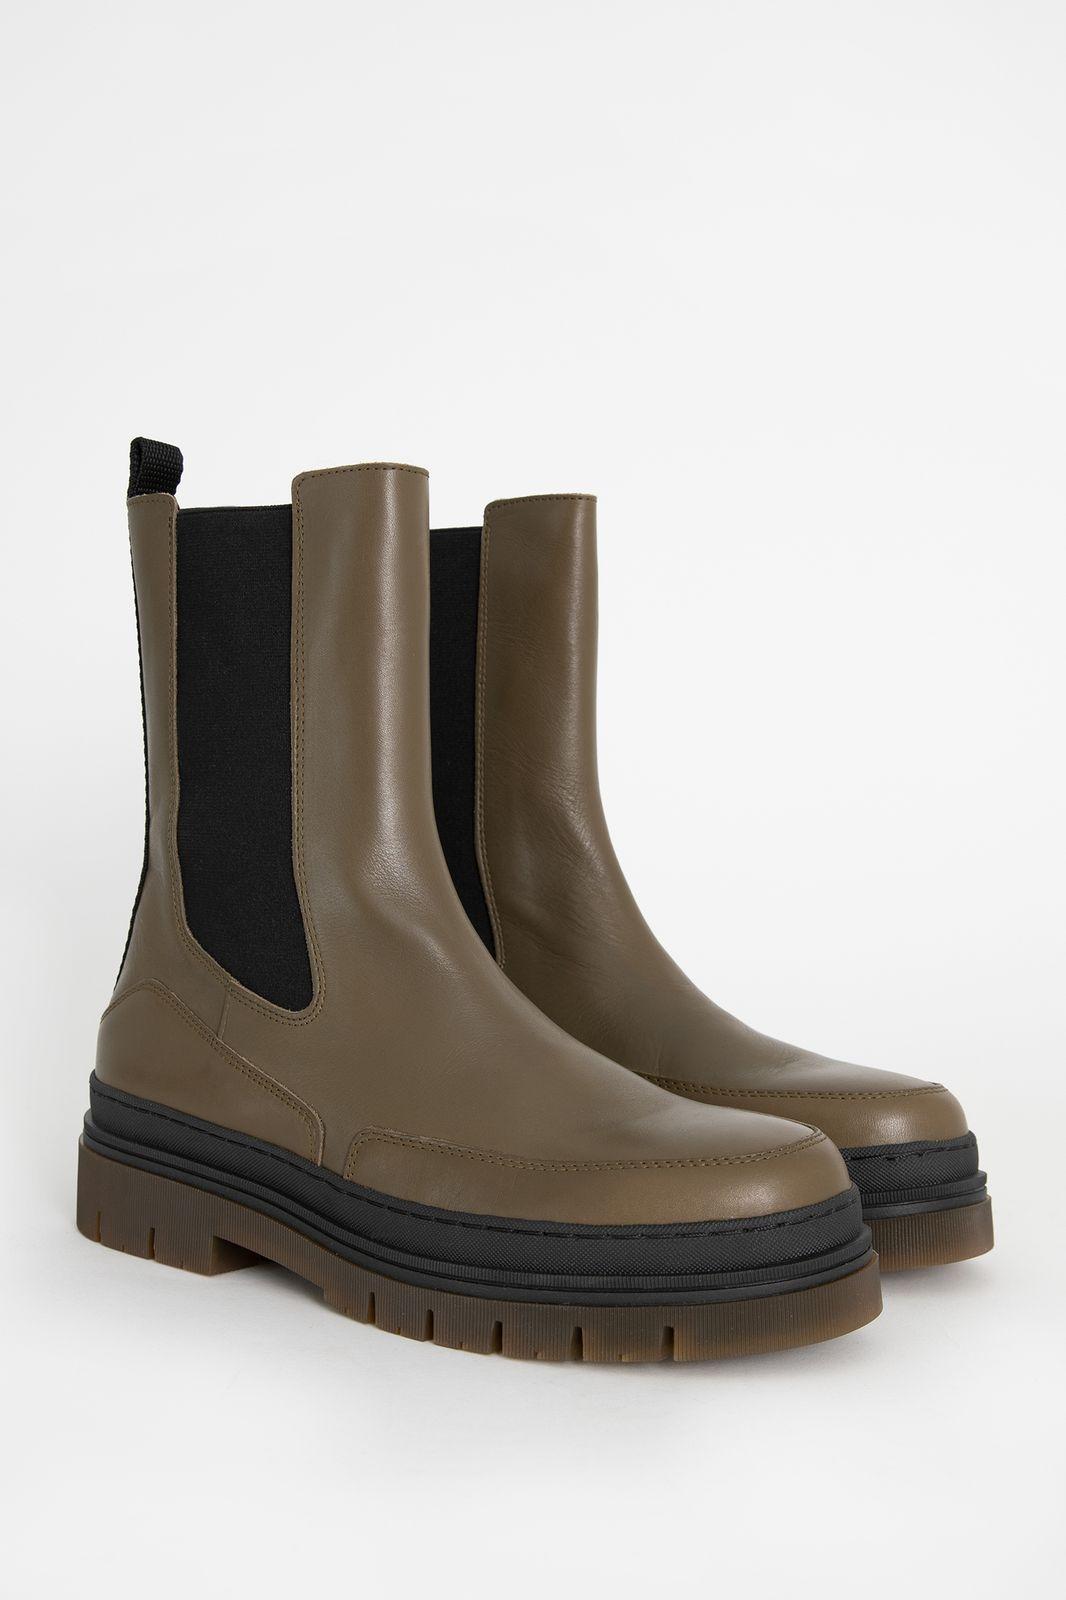 Groene chelsea boots met chunky zool - Dames | Sissy-Boy